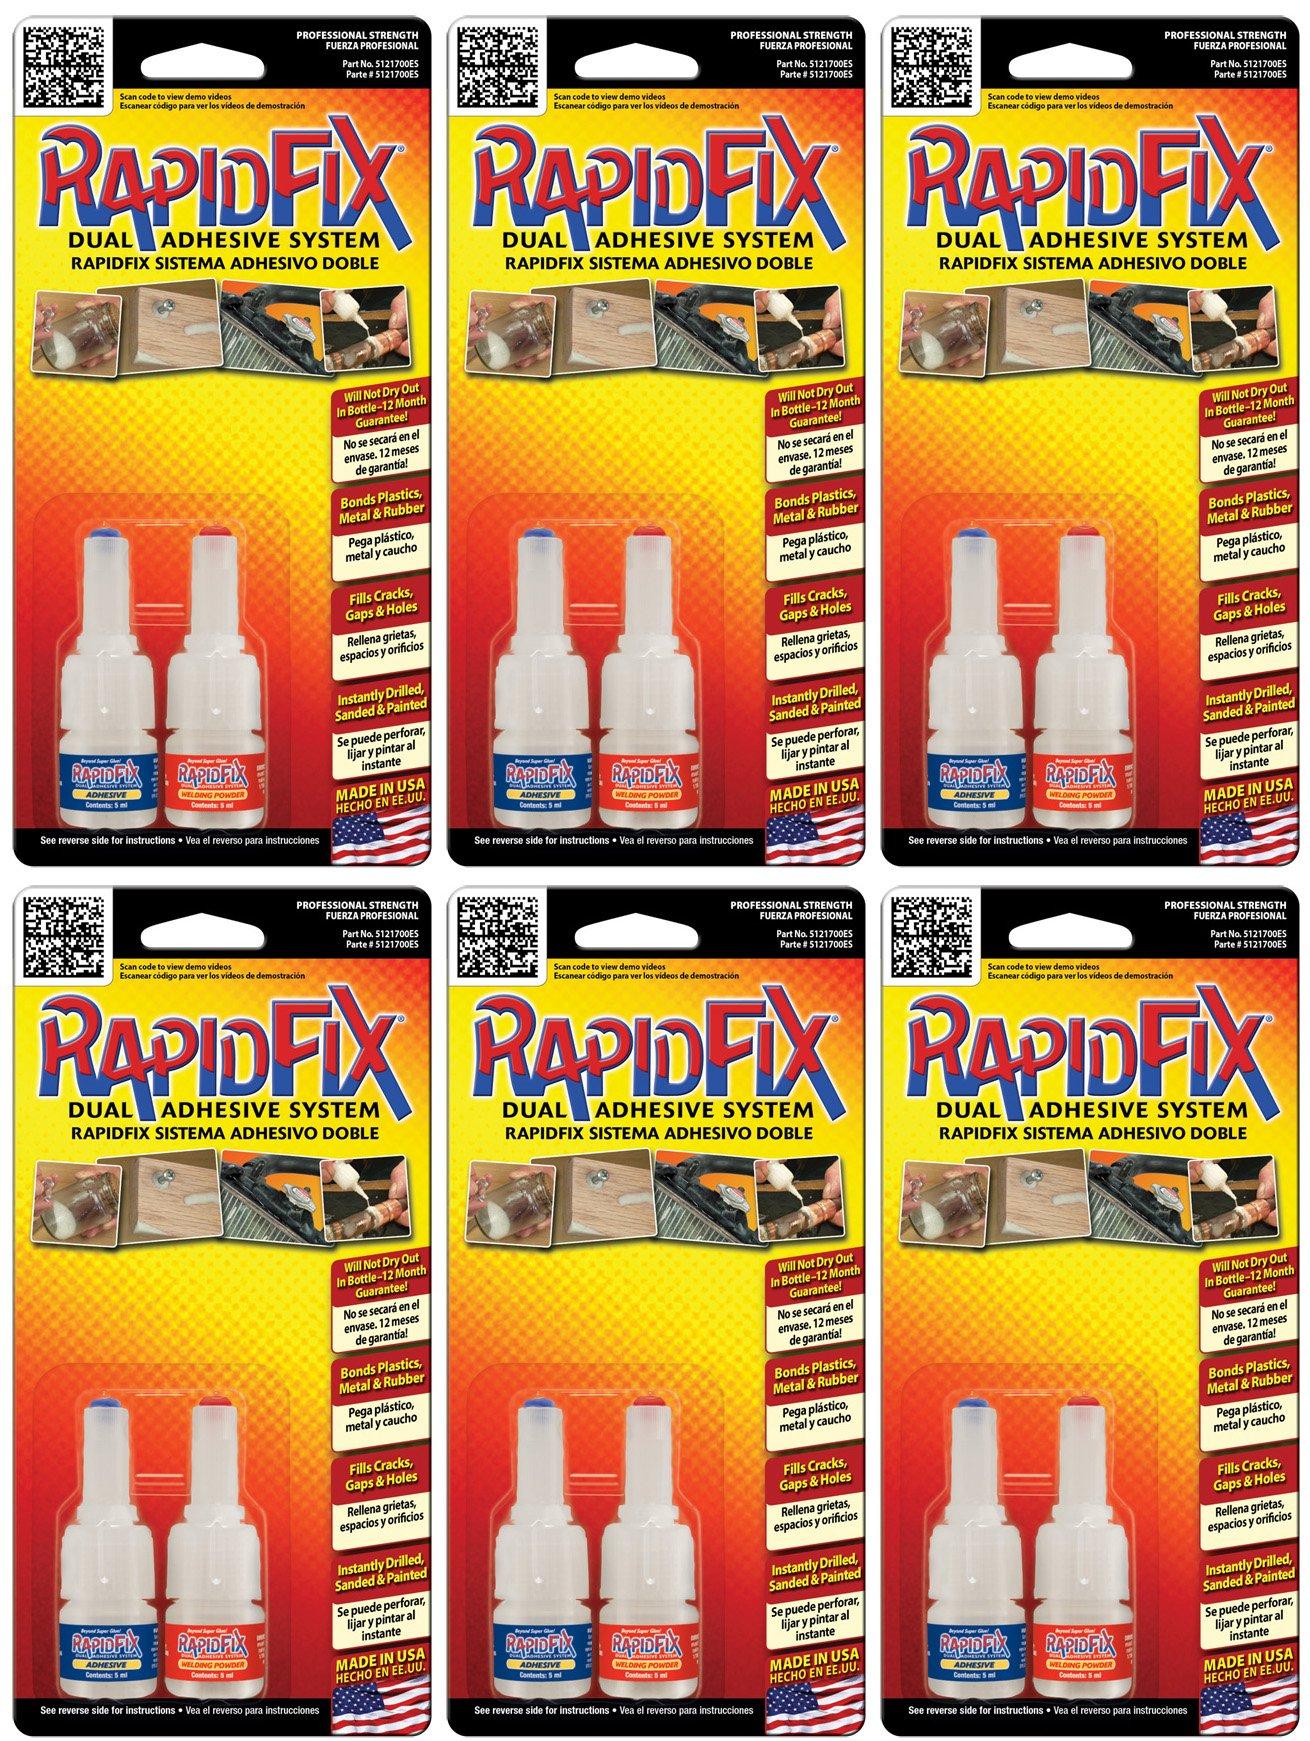 RapidFix Dual Adhesive System Multi-Pack, 6-Pack, 5 ml.Size